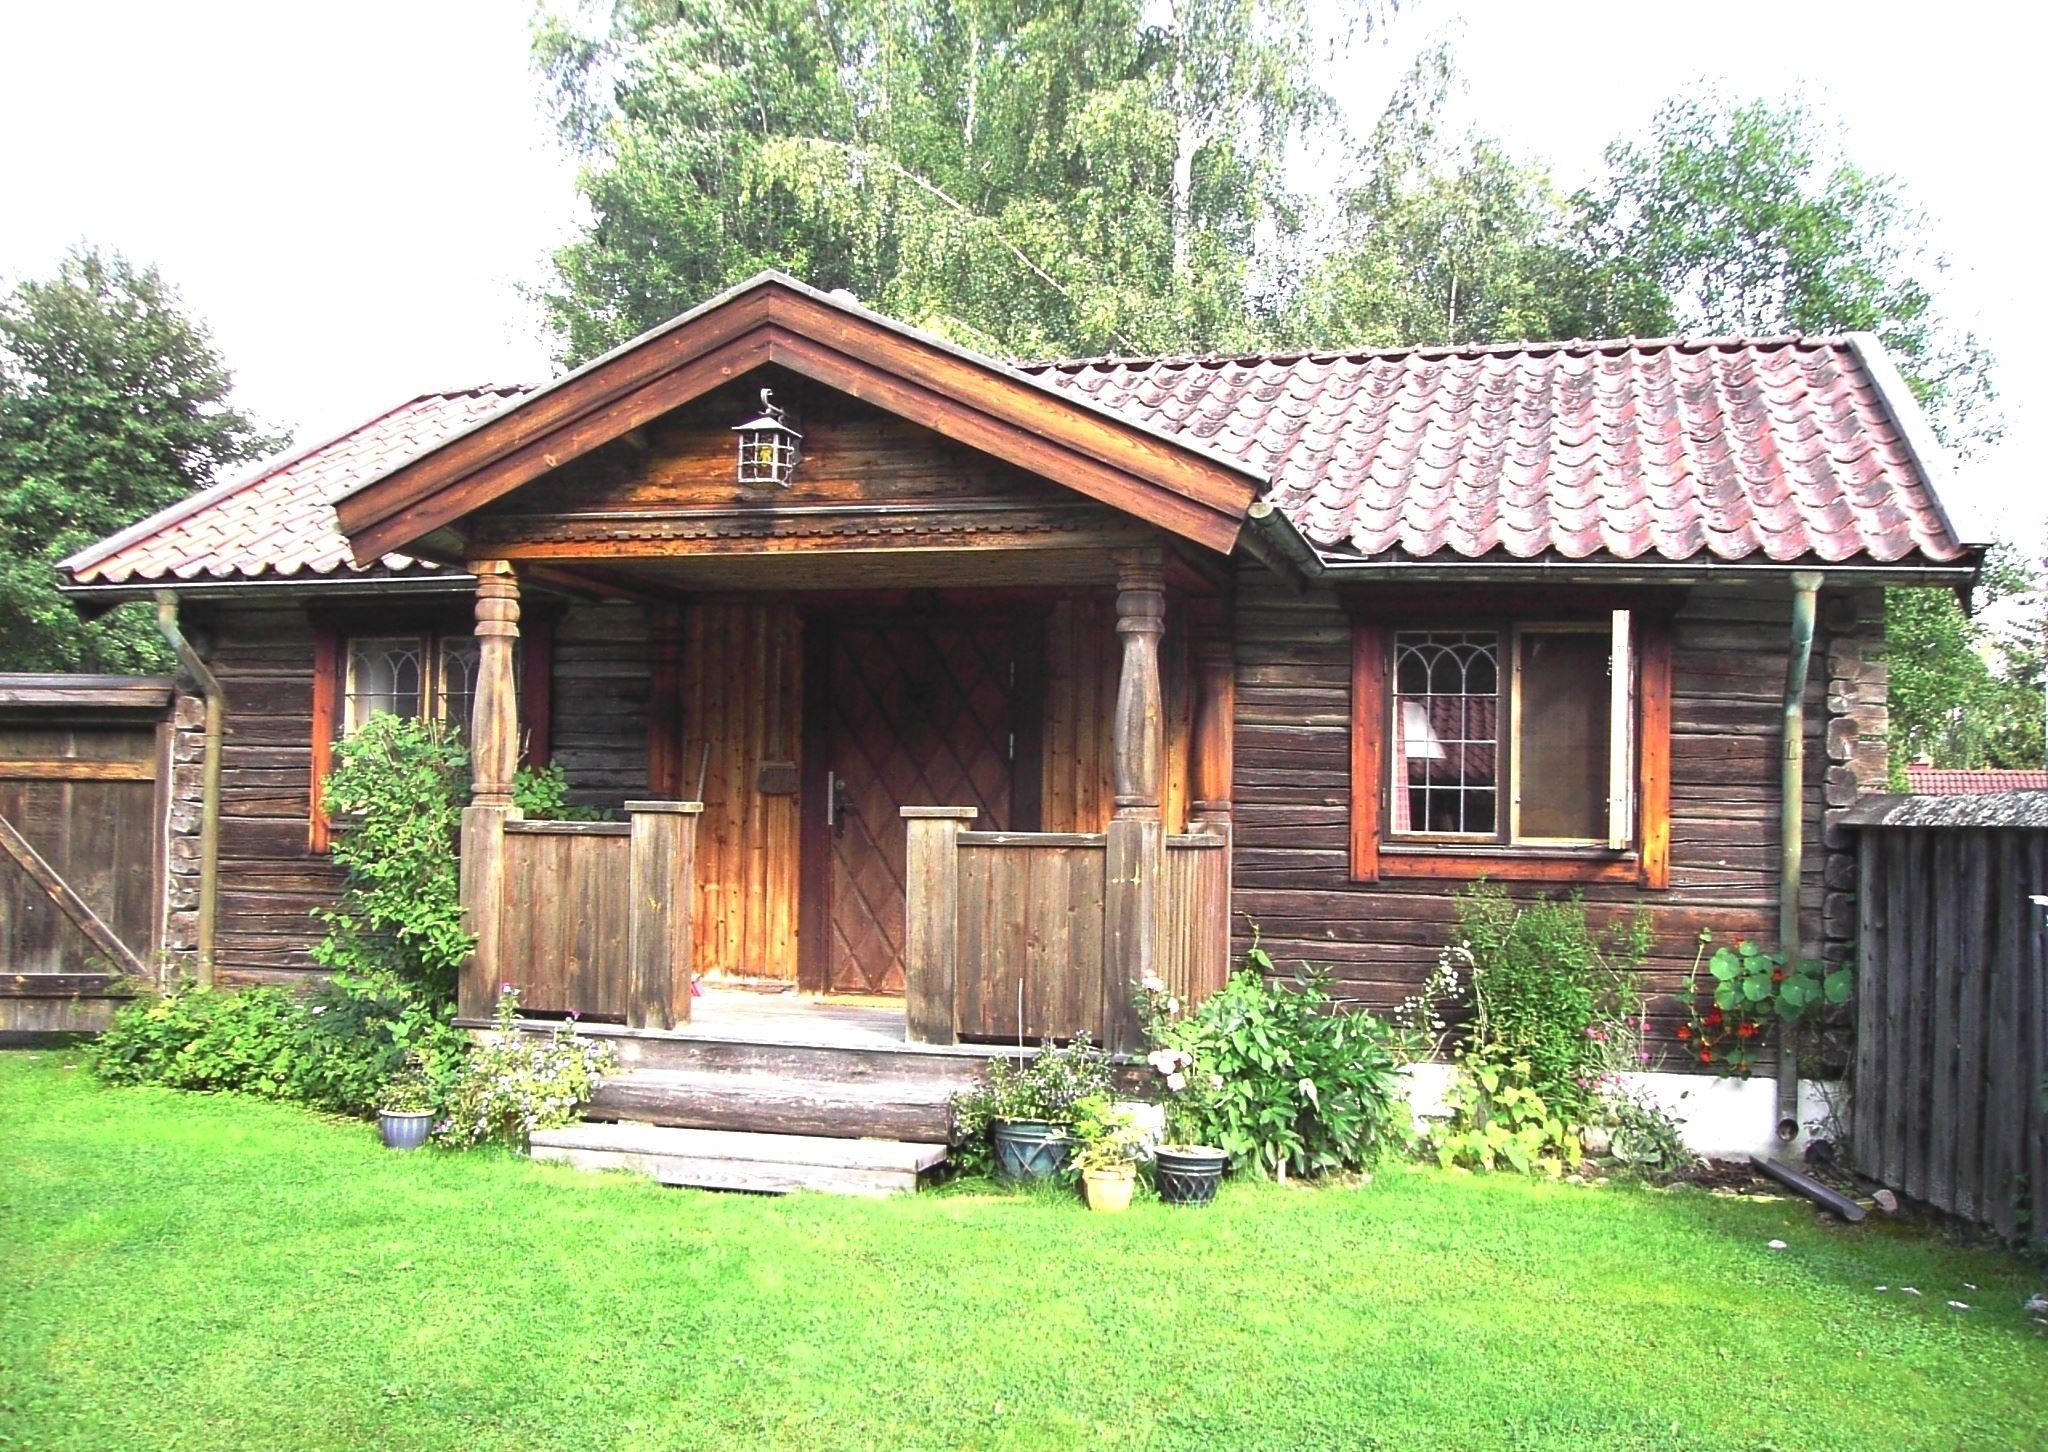 L605 Tällberg, 12 km N Leksand